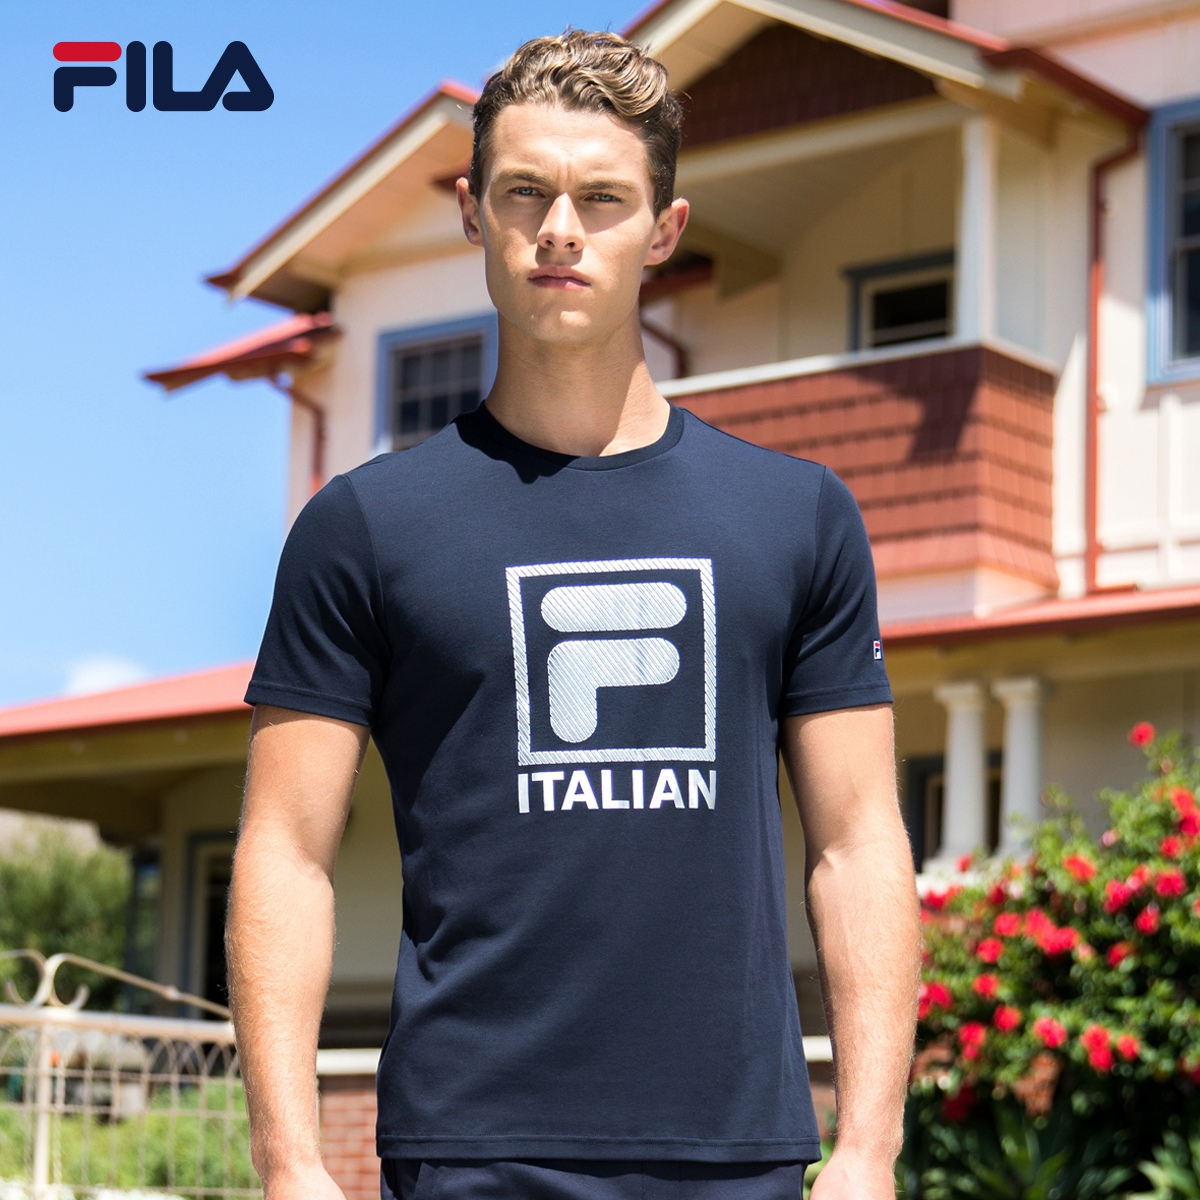 b4f824f03e FILA Fei Le men's T-shirt 2019 summer new F LOGO printing T-shirt  short-sleeved shirt sports T-shirt men